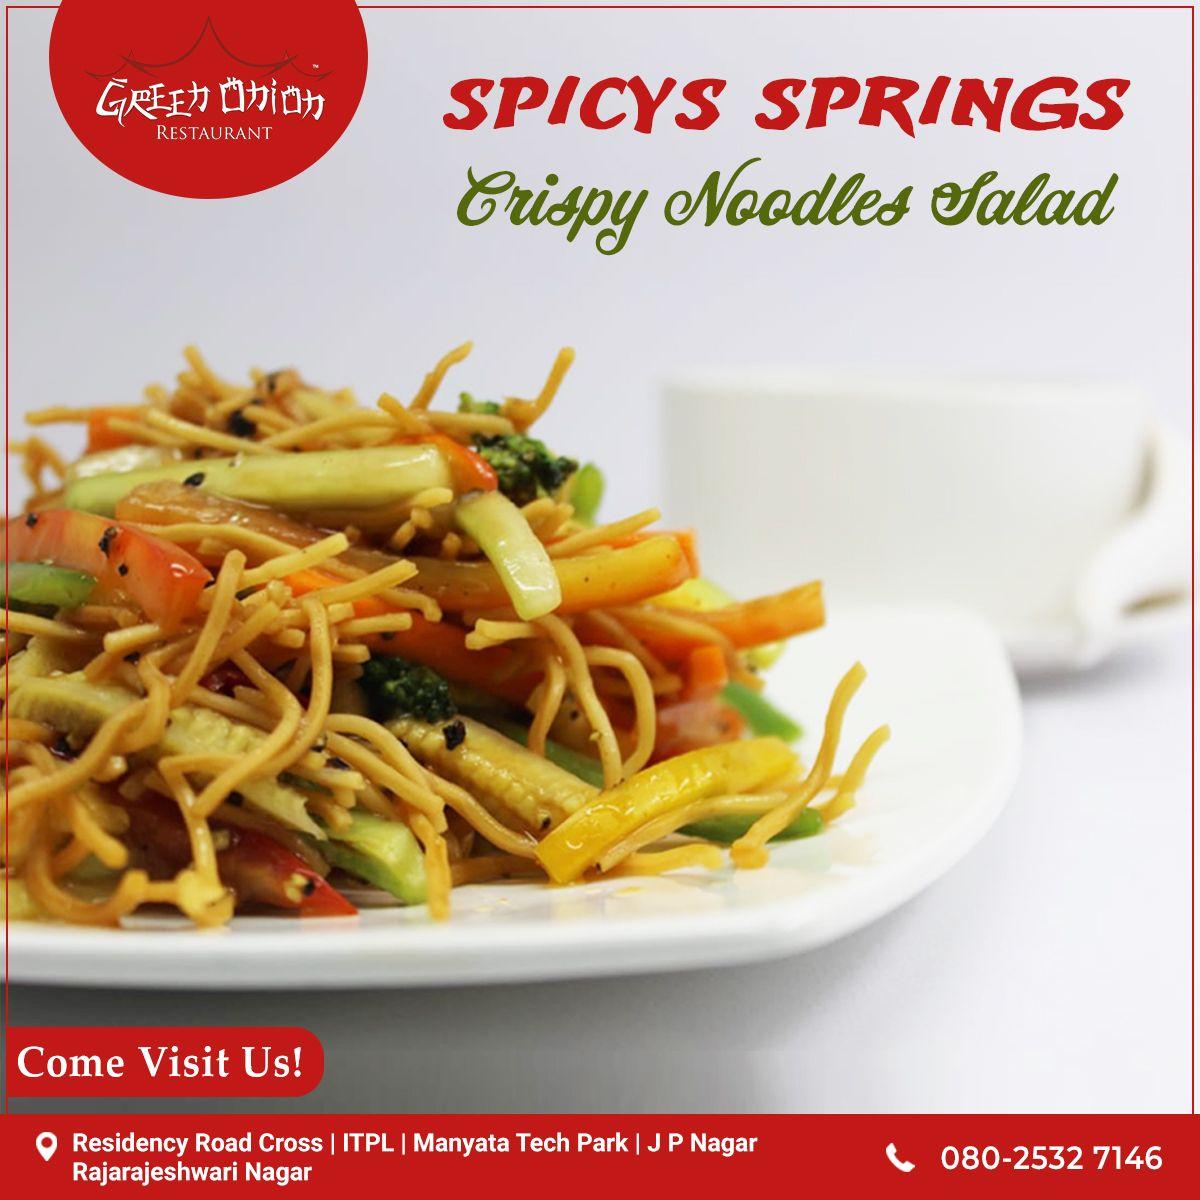 Best Time Pass Is To Eat Noodles Enjoy Eating Crispy Noodles Salad From Green Onion Visit Our Nearest Restaurant Now Food Crispy Noodle Salad Noodles Lover